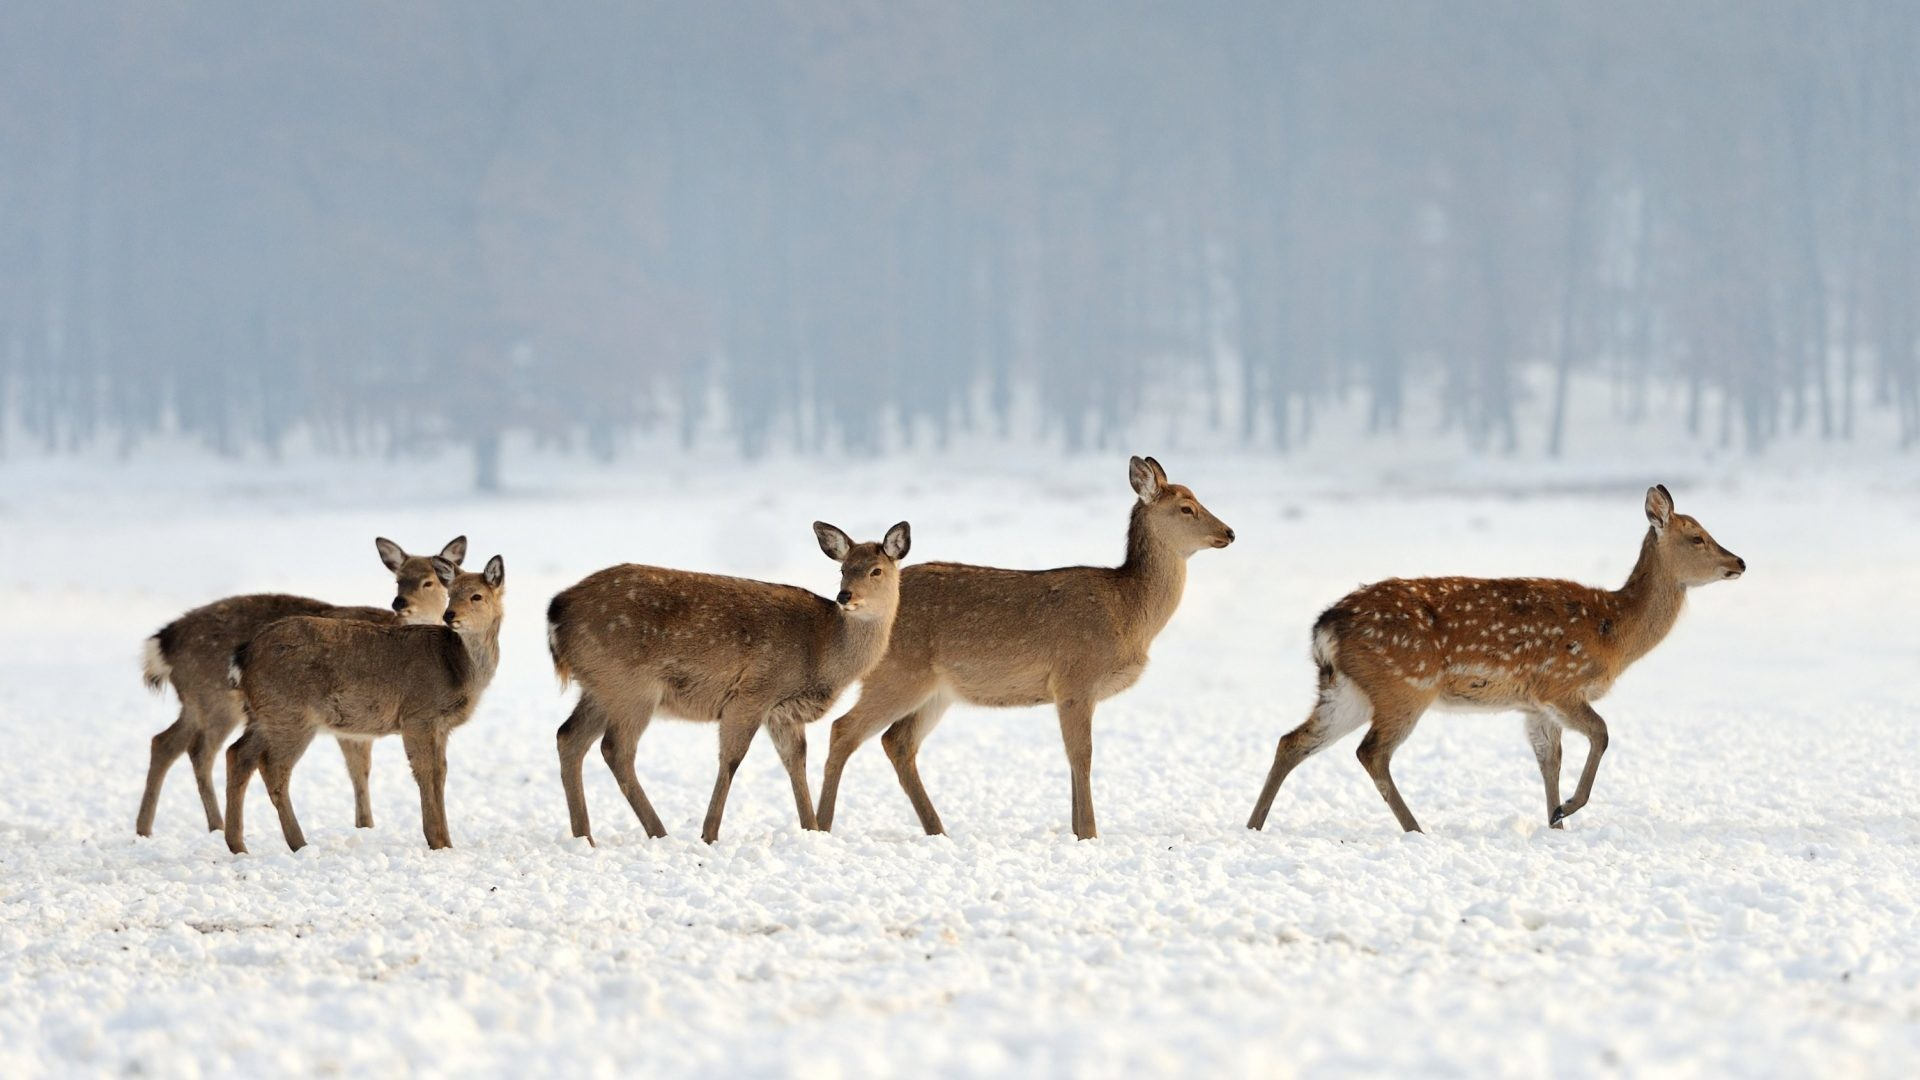 Animals – Winter Deer Snow Nature Landscape Desktop Animals Download for HD  16:9 High